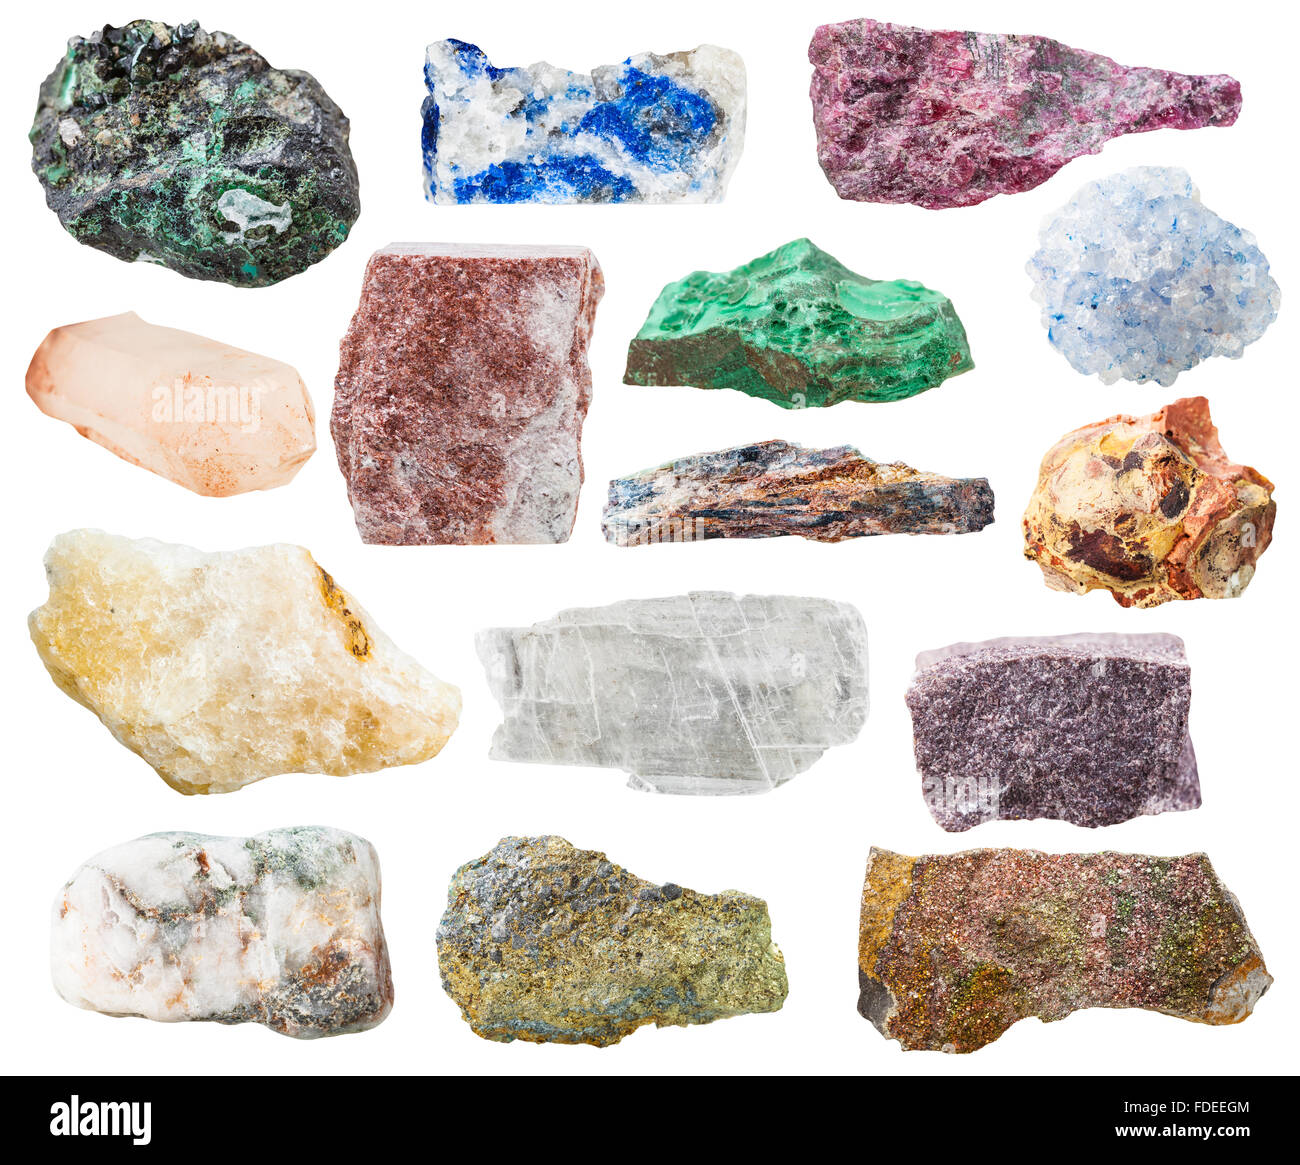 many natural rocks and stones - lazurite, bauxite, eudialyte, alunite, schist, malachite, pyrite, quartz, aventurine, - Stock Image